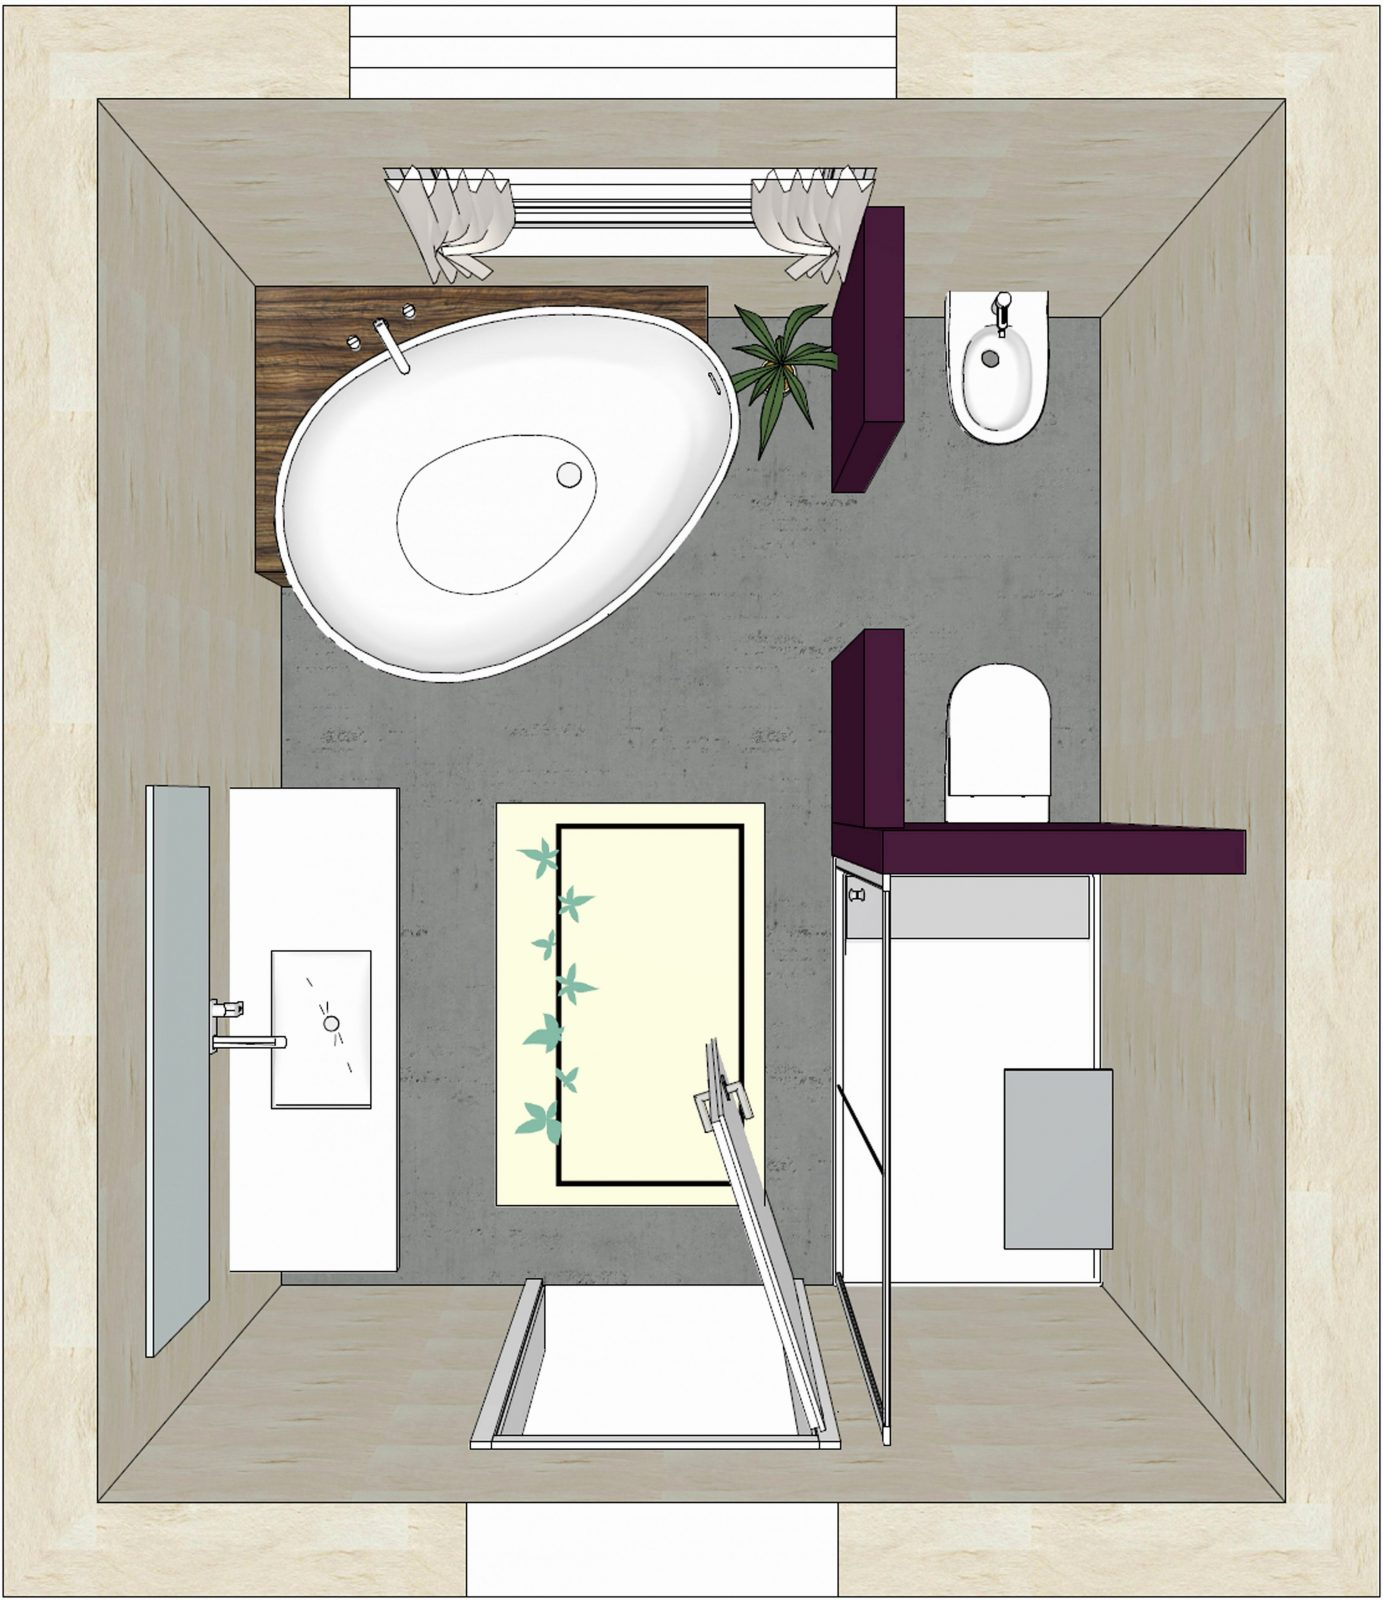 Grundriss Badezimmer 10 Qm Inspirierend Bad Grundriss Ideen  Haus von Grundriss Badezimmer 10 Qm Bild